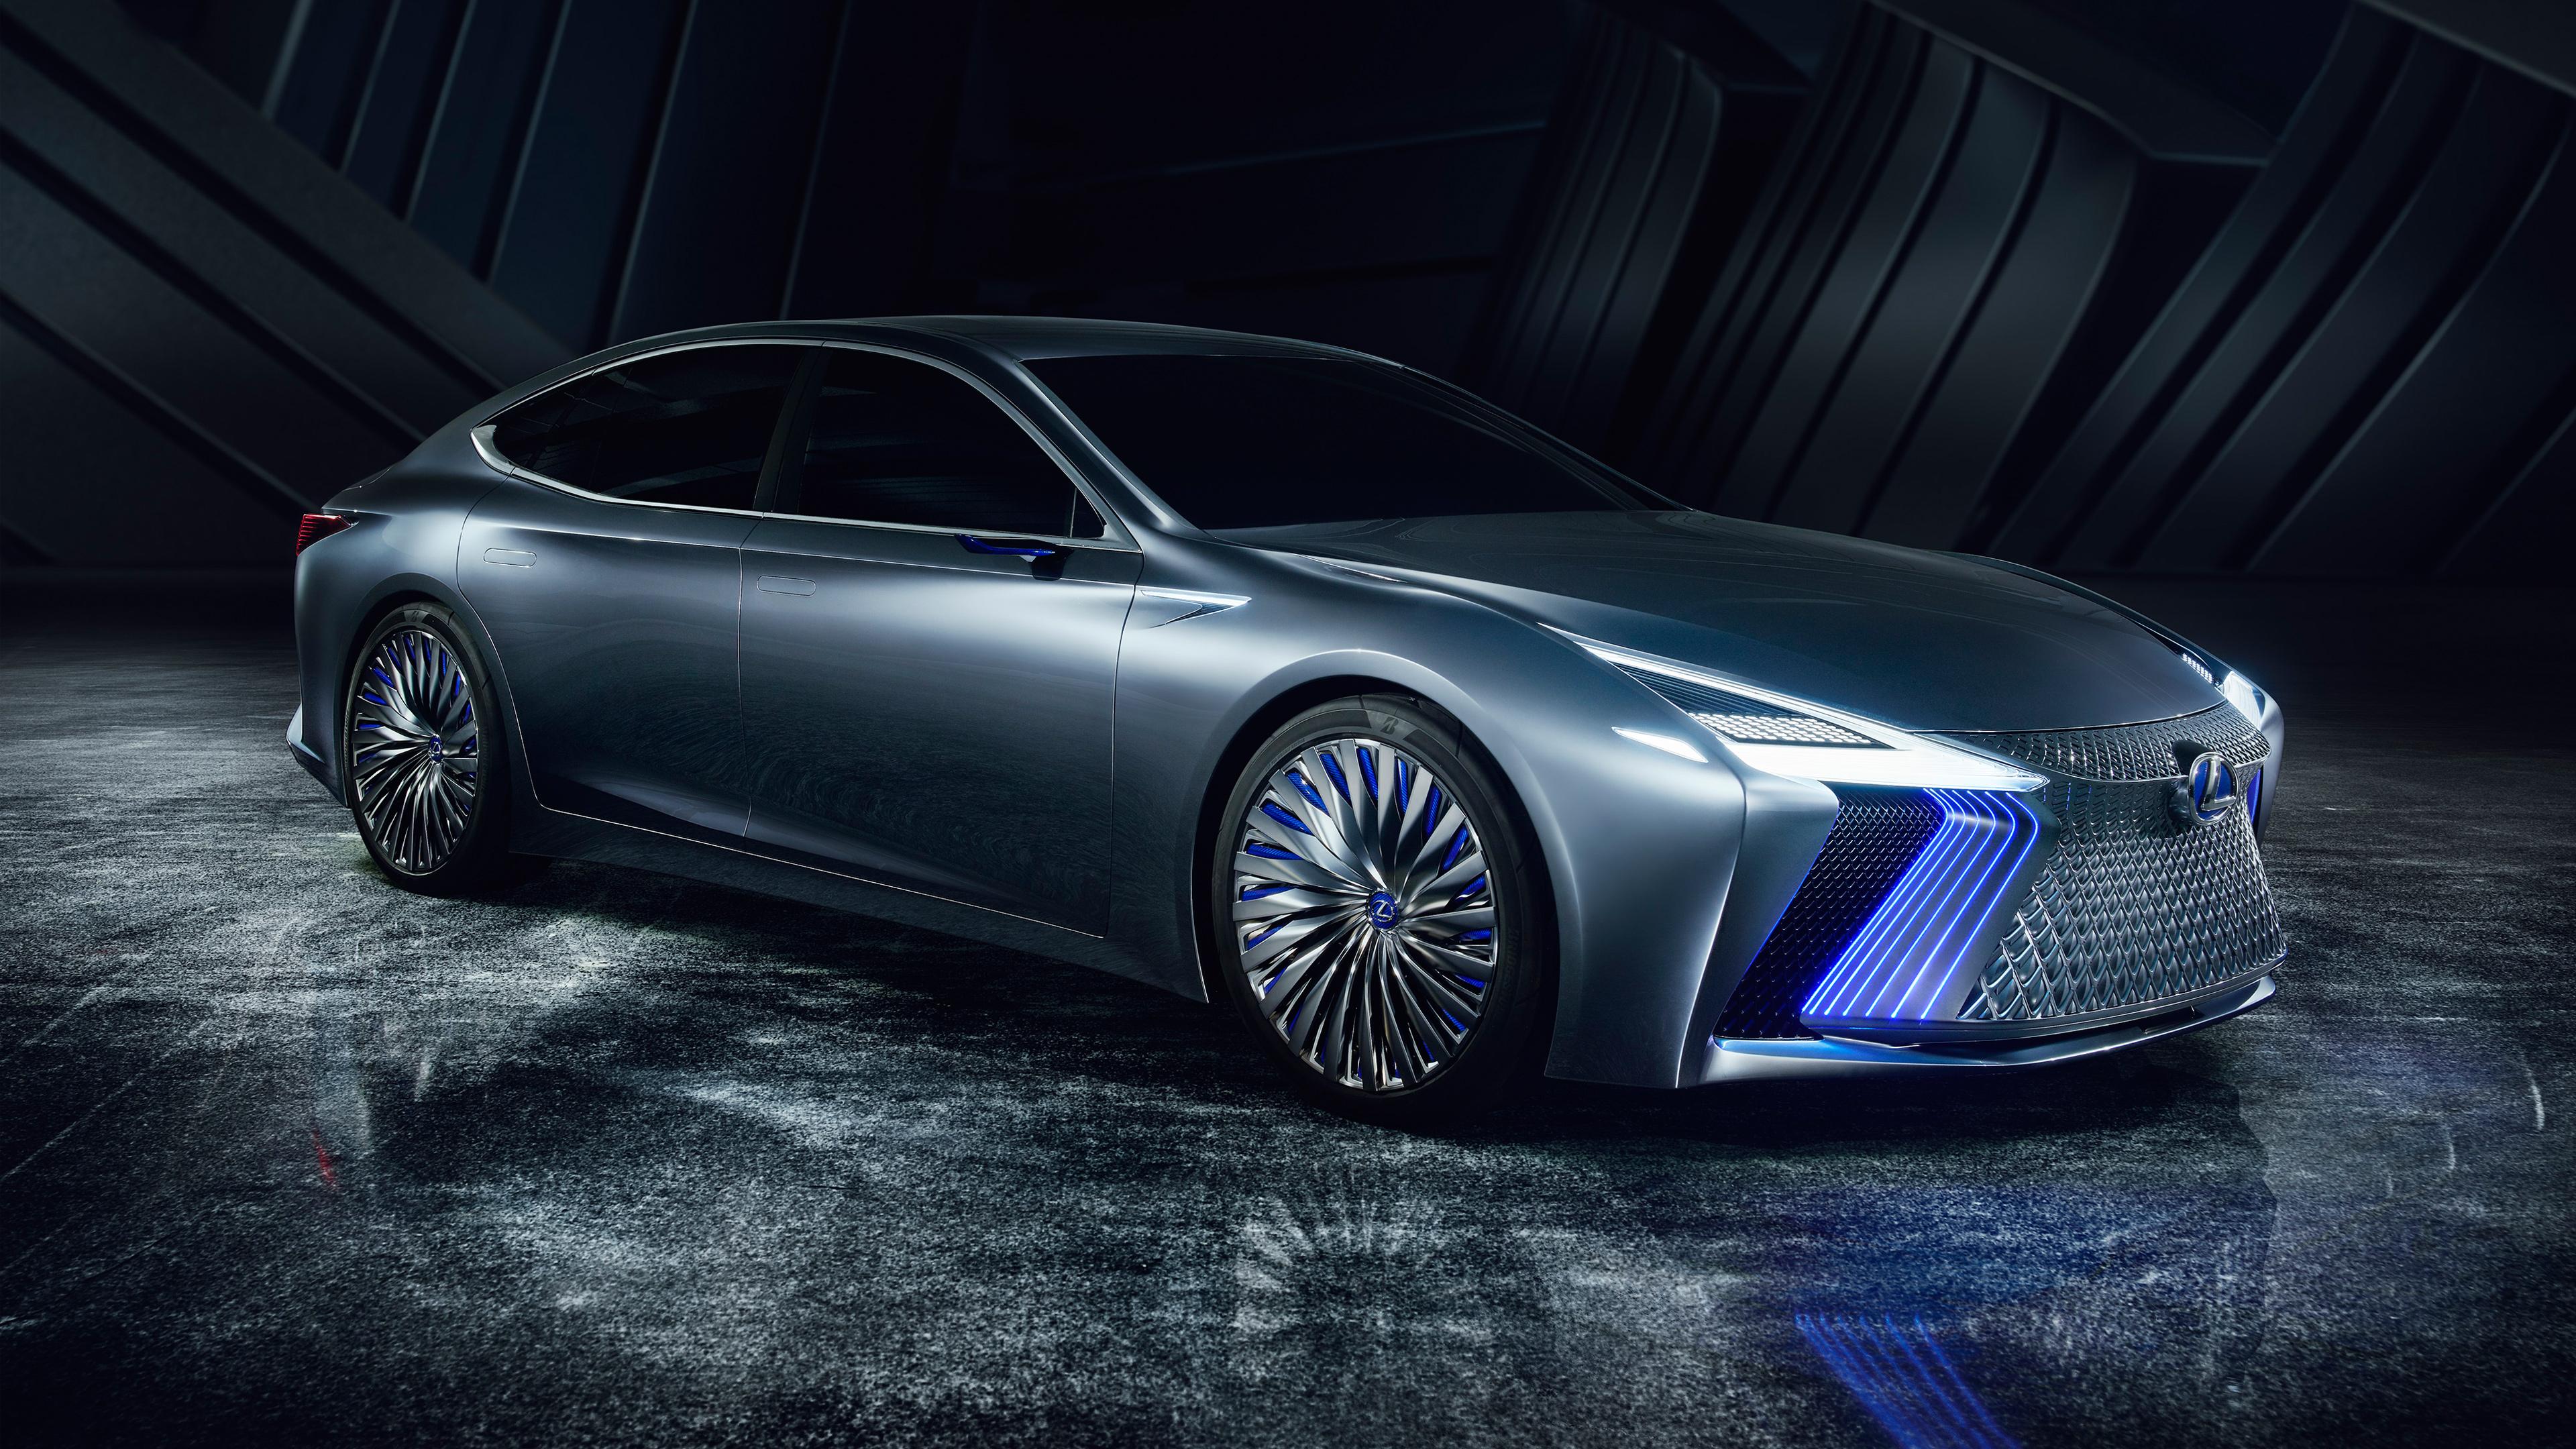 2017 Lexus LS Plus Concept 4K 2 Wallpaper | HD Car ...